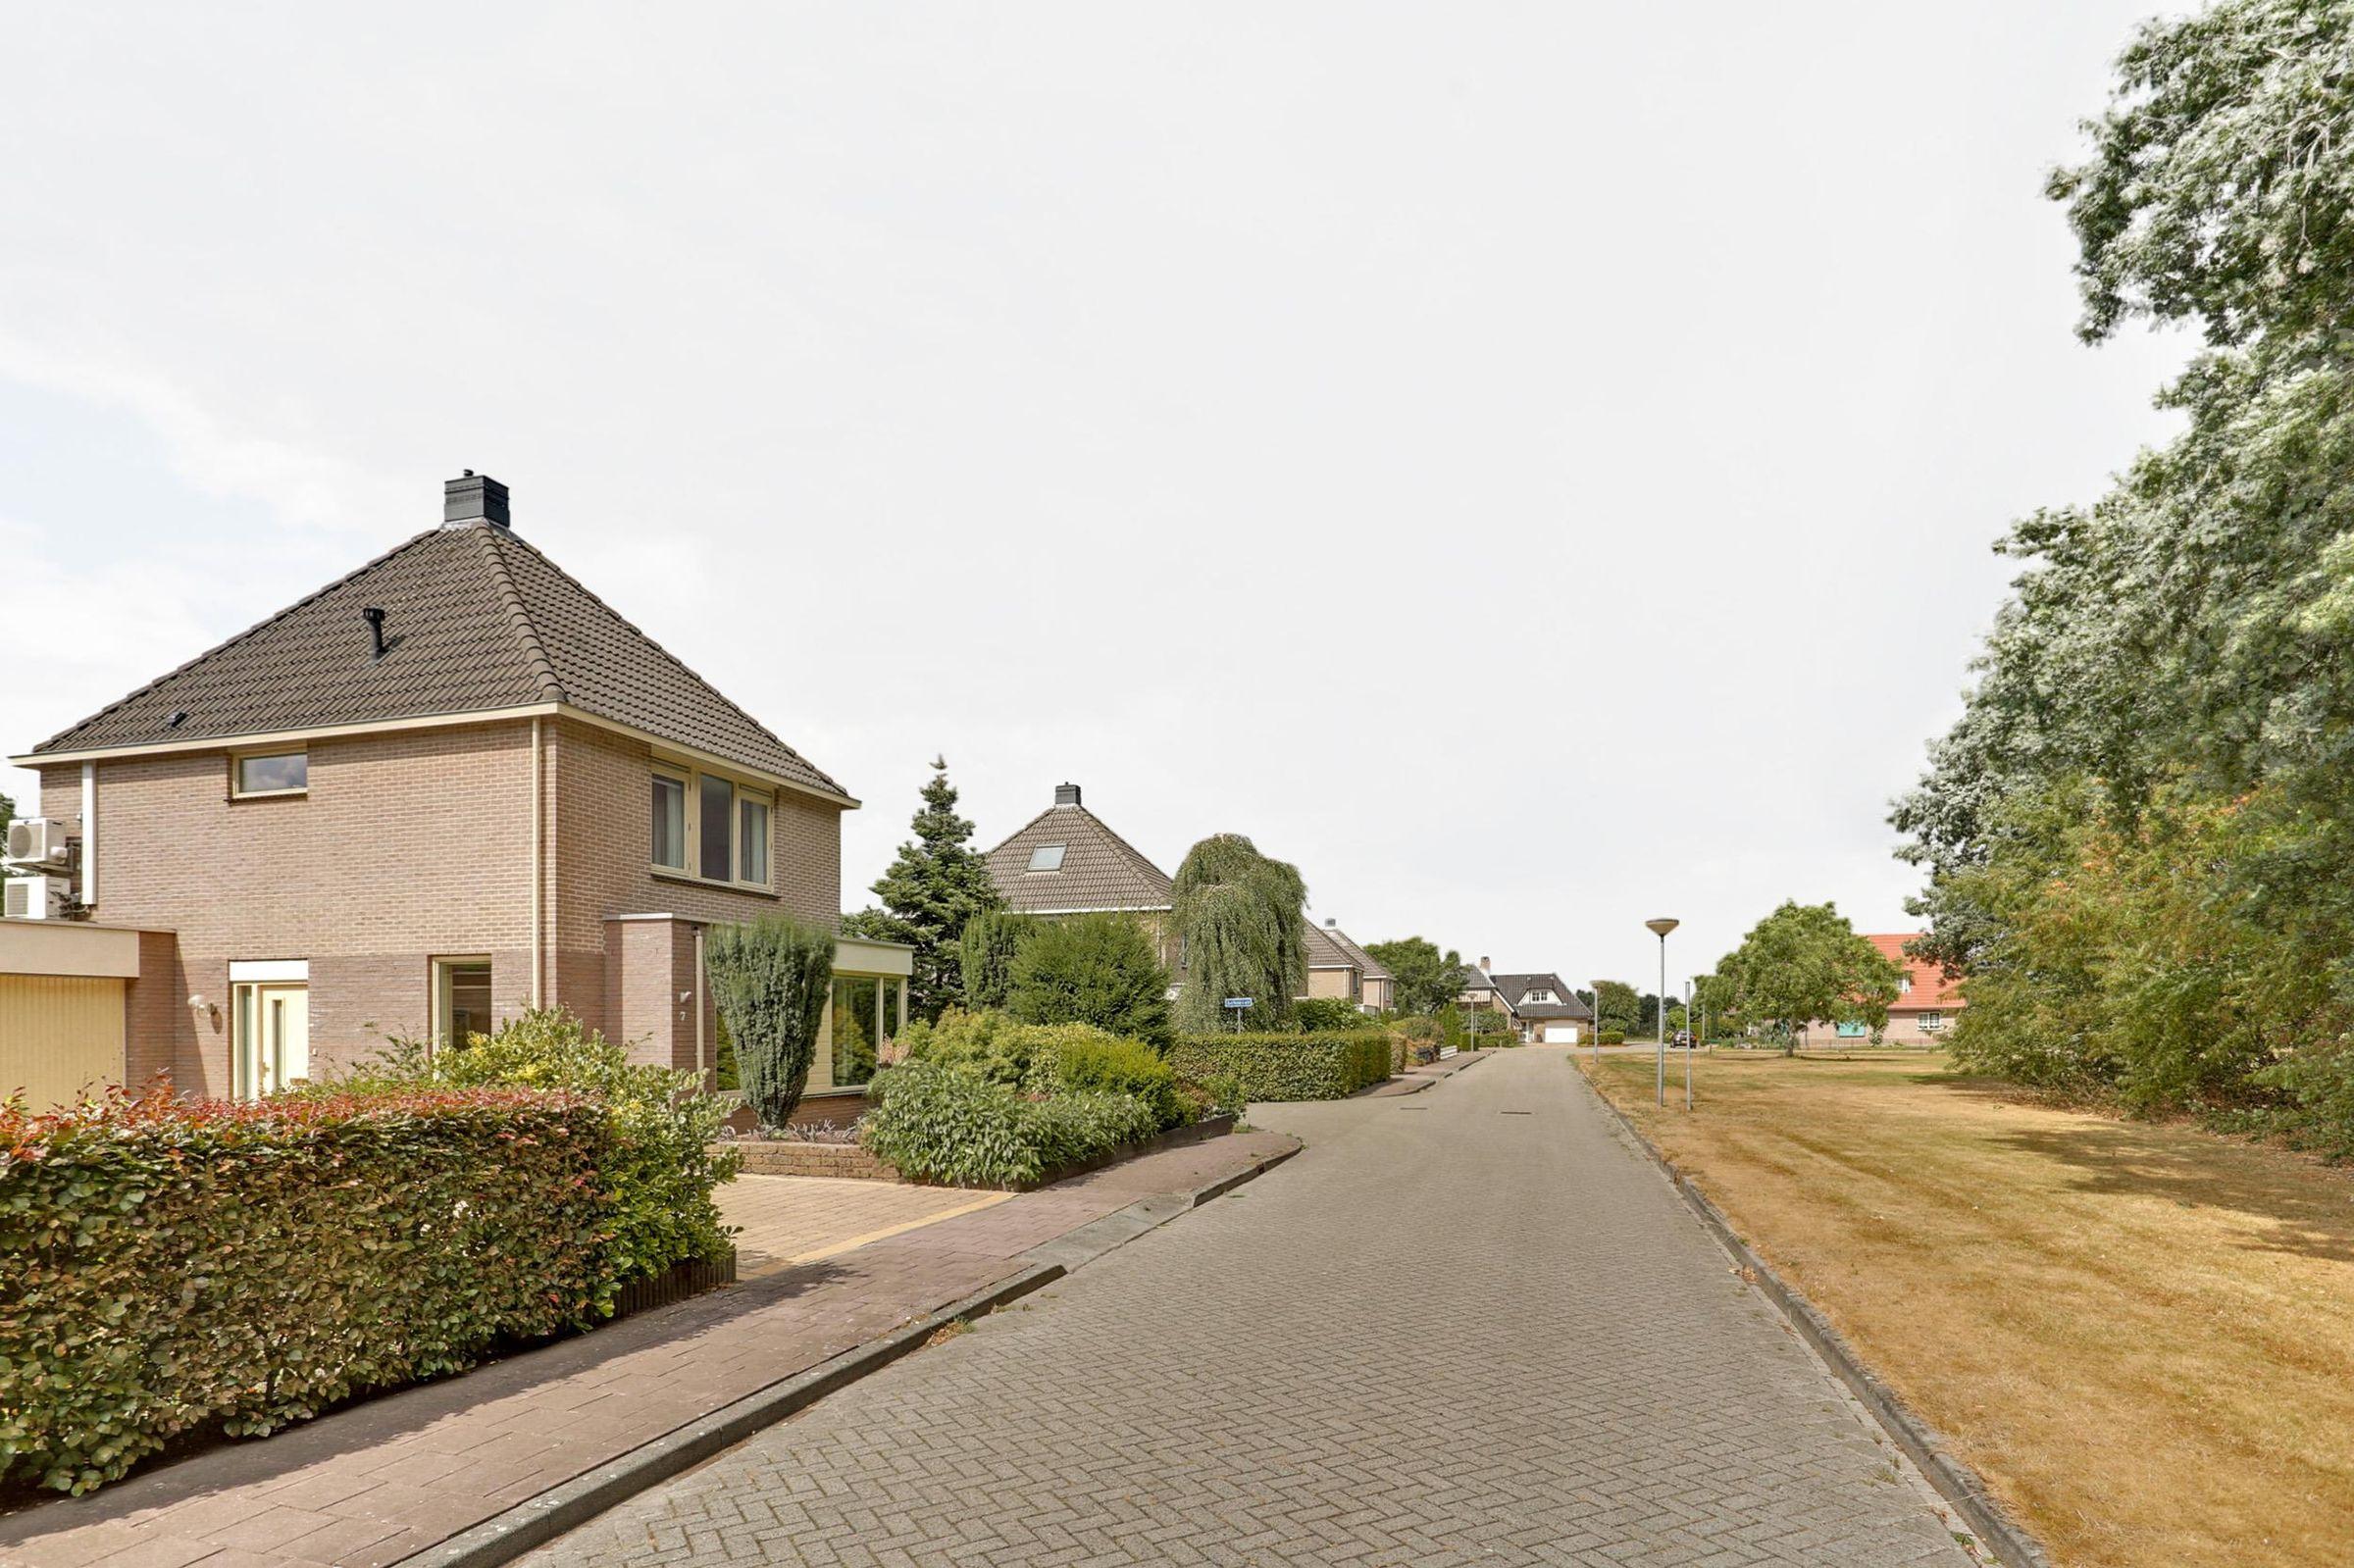 Klipper 7, Nieuw-Amsterdam